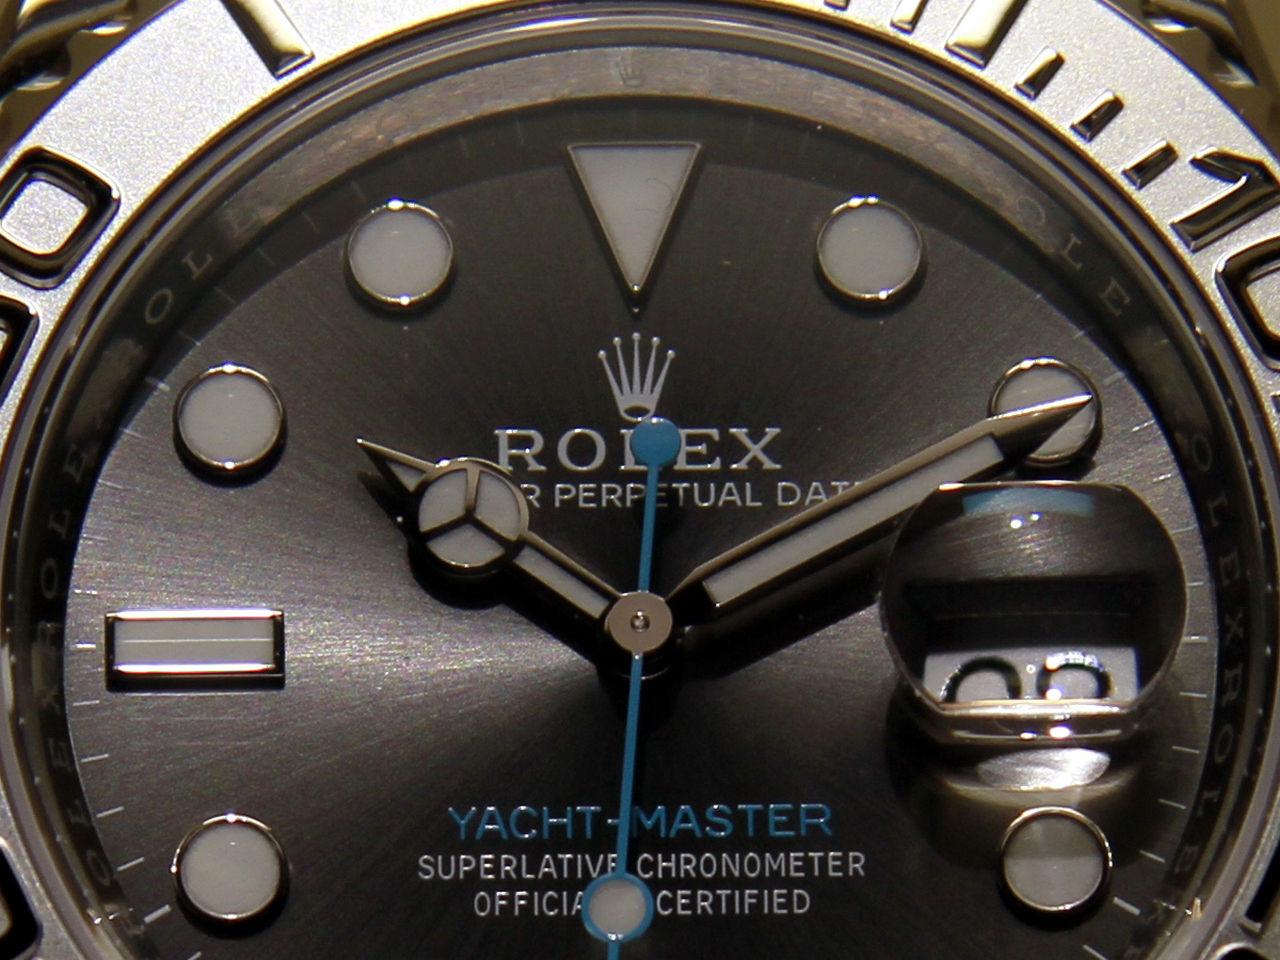 baselworld-2016_rolex-yacht-master-prezzo_0-100_8